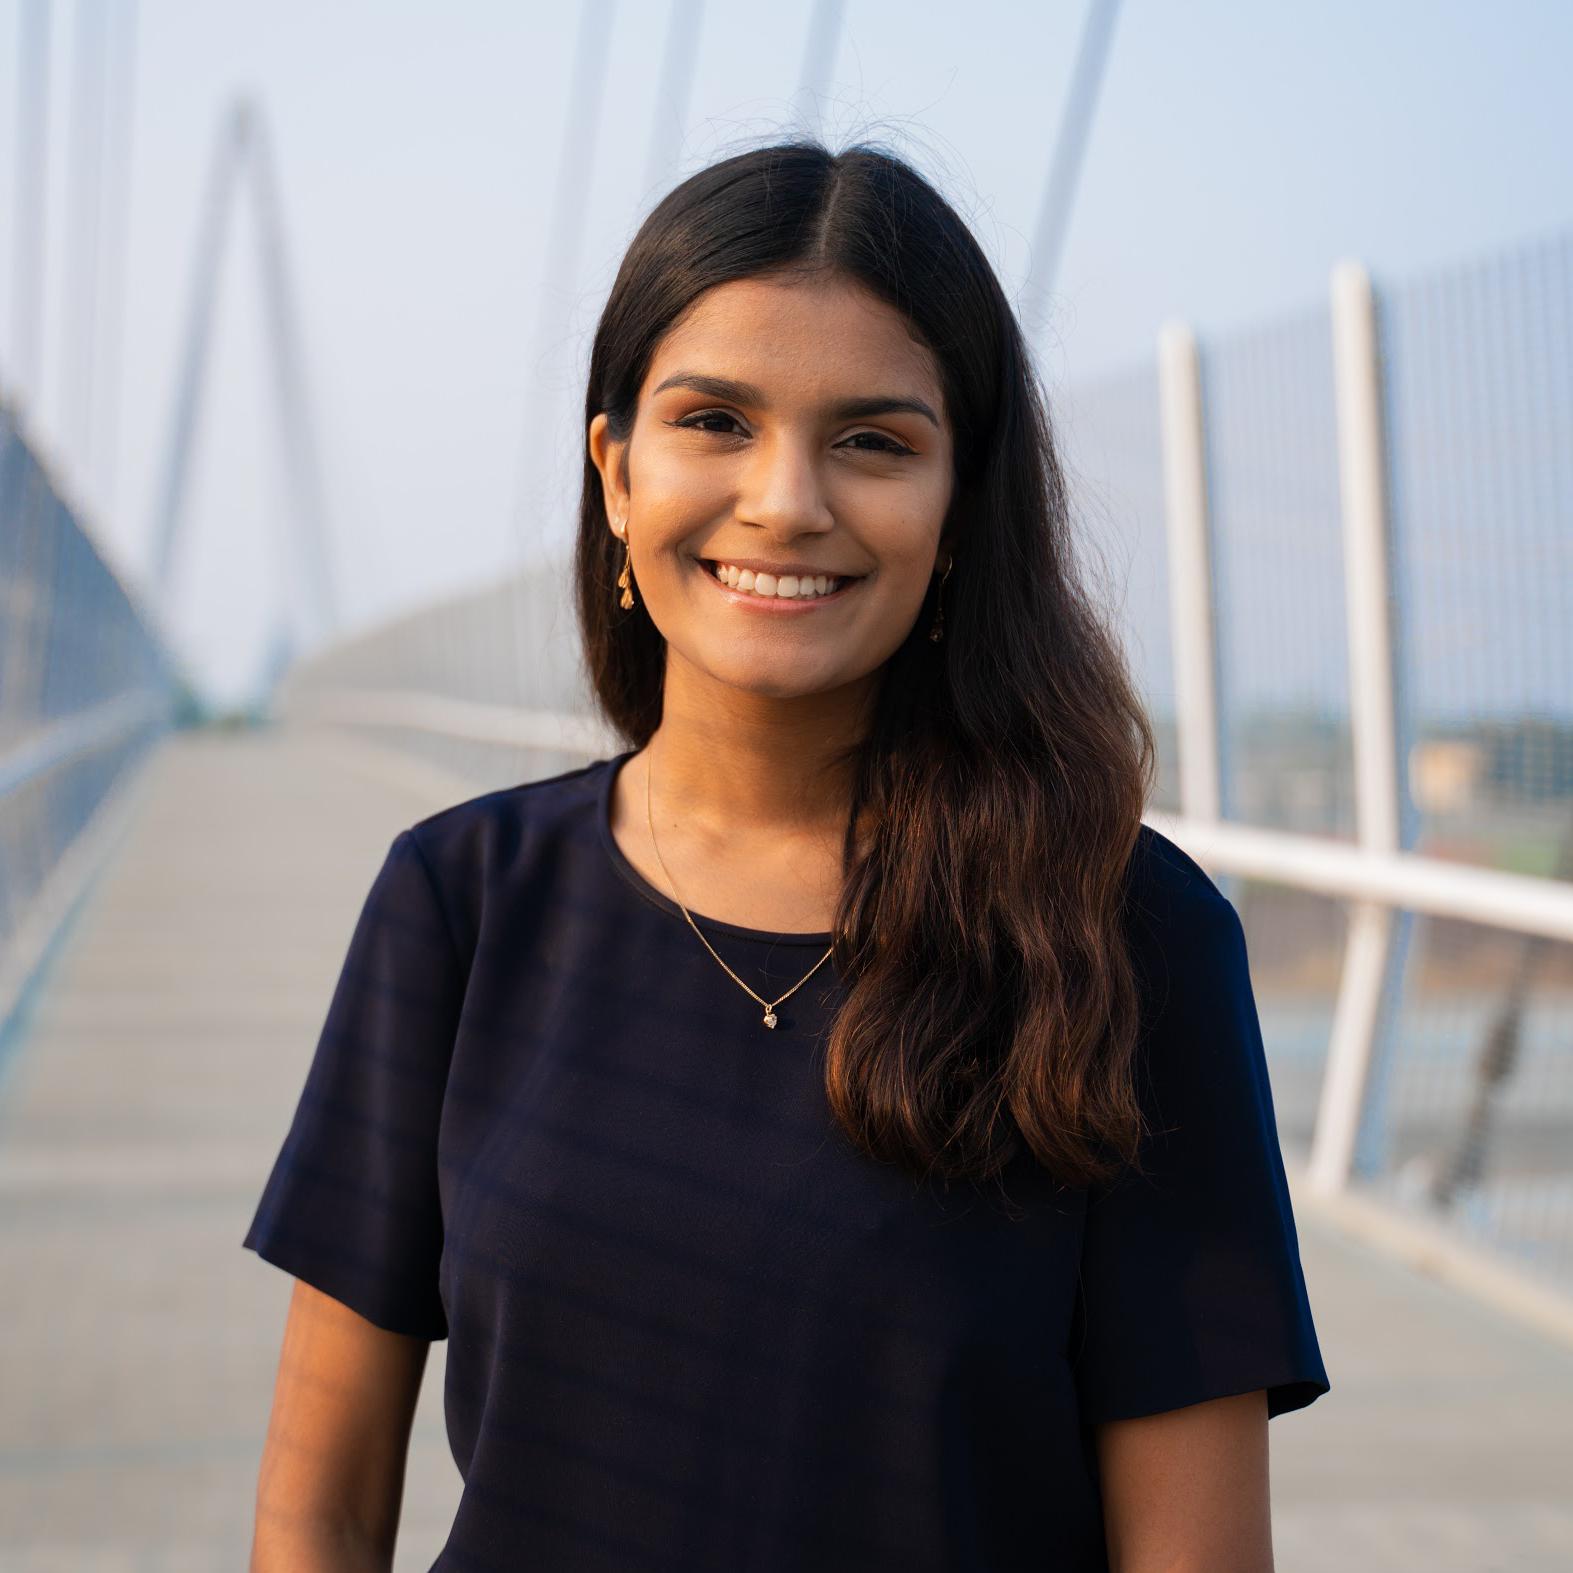 Headshot of Saasha Mane.